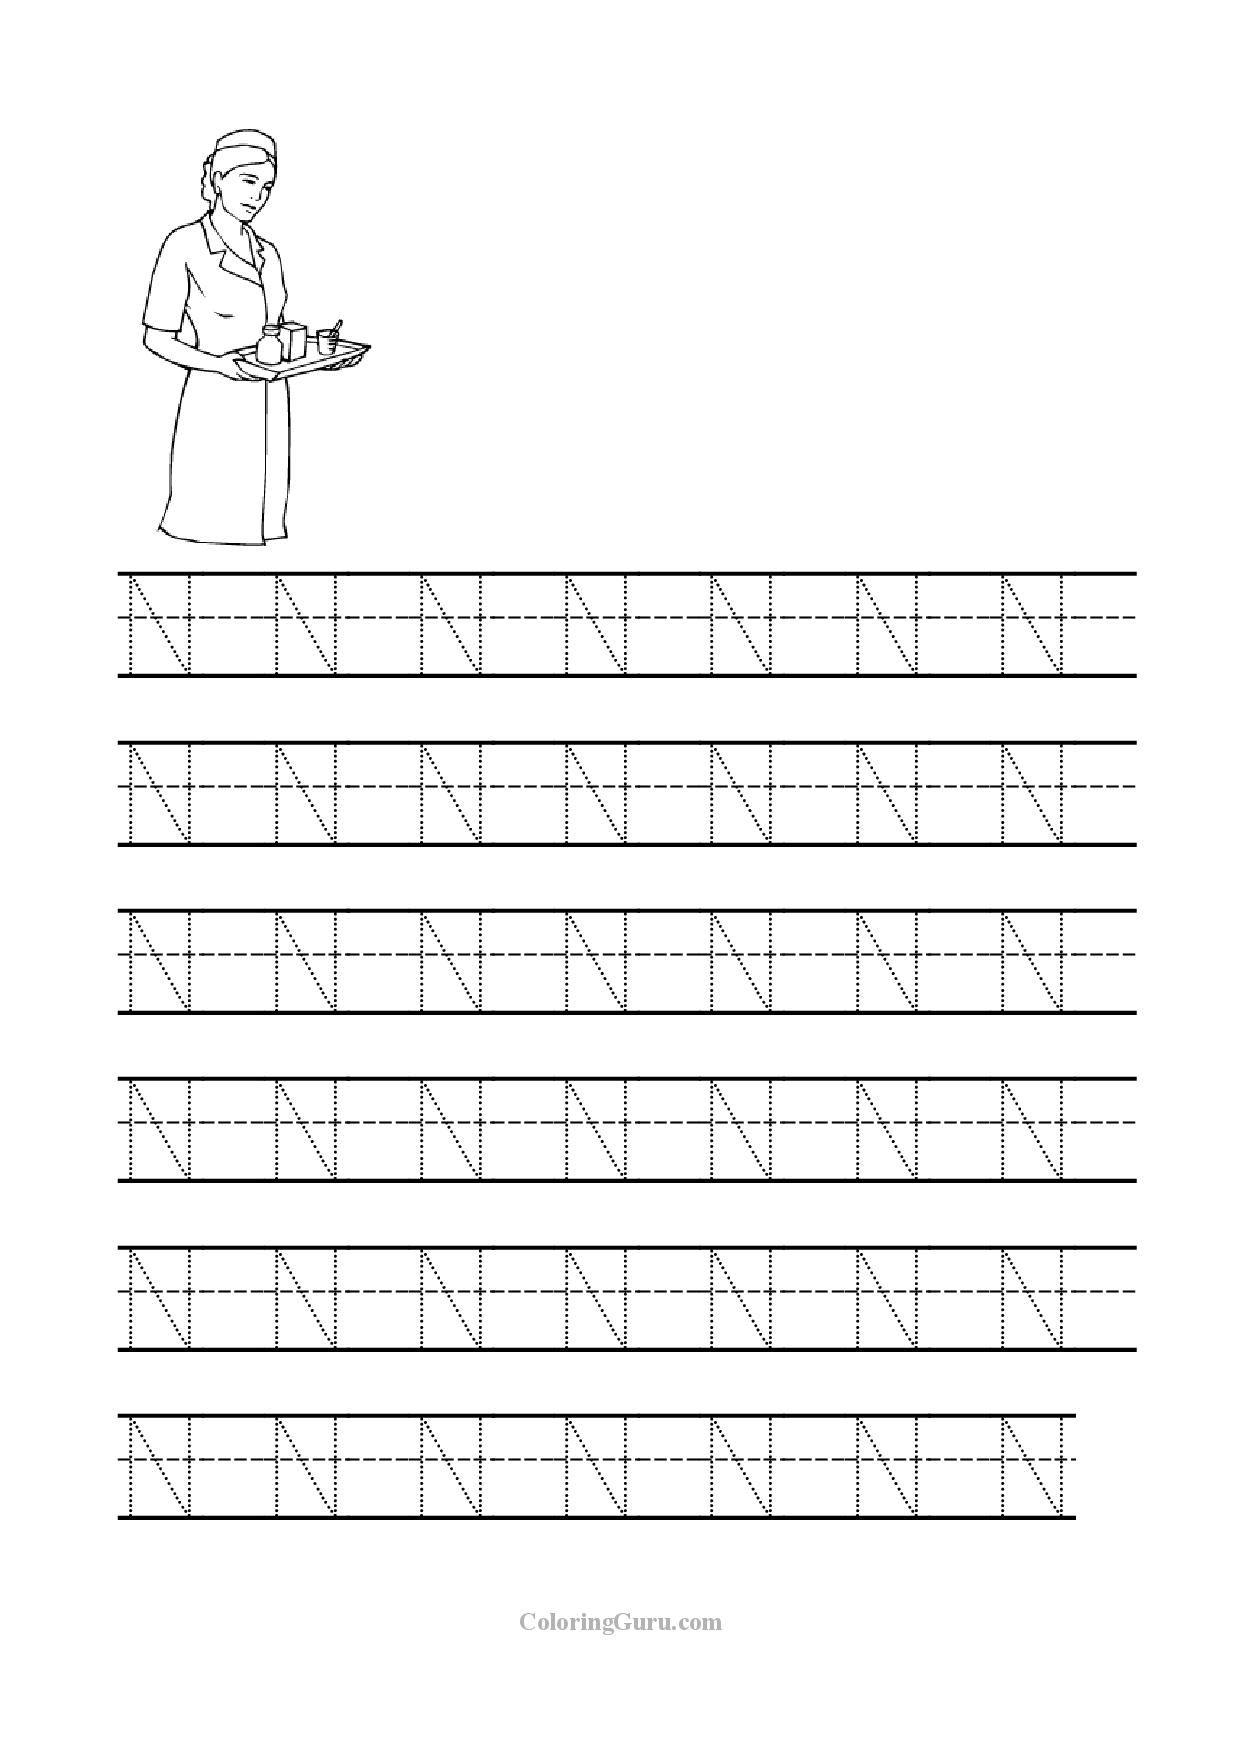 Free Printable Tracing Letter N Worksheets For Preschool in N Letter Tracing